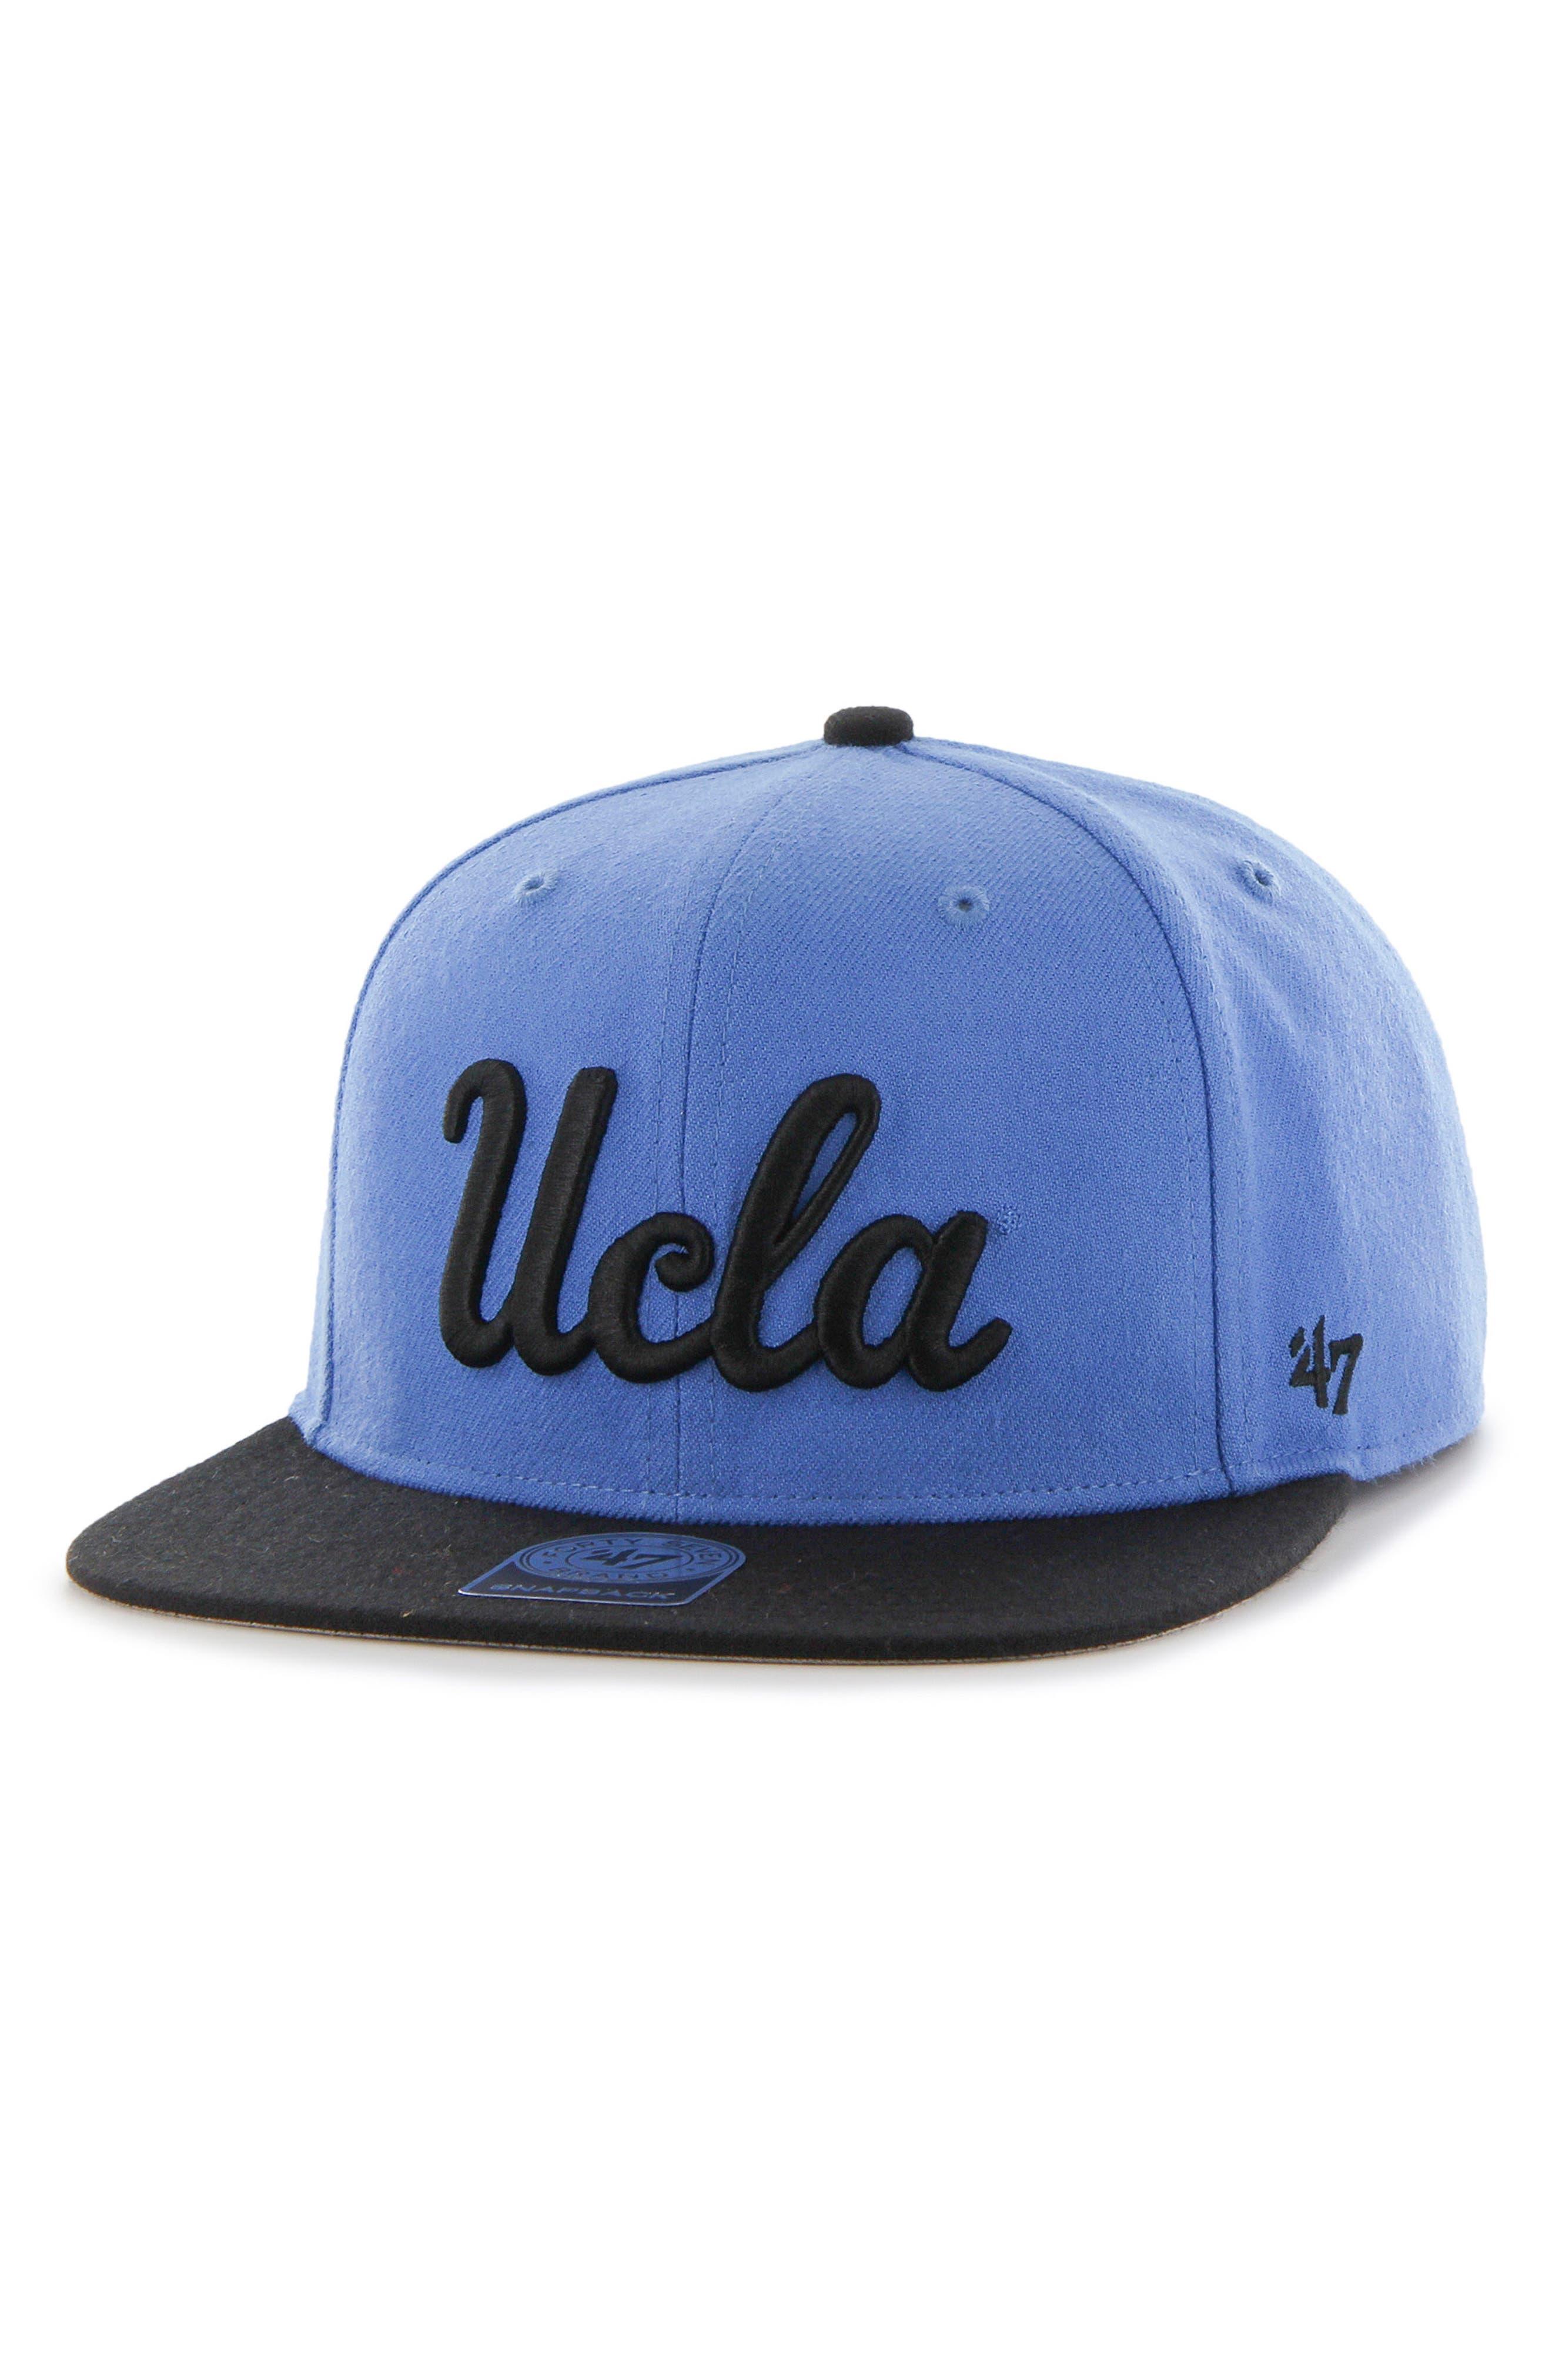 Collegiate Two Tone Wool Cap,                         Main,                         color, Blue Ucla Bruins